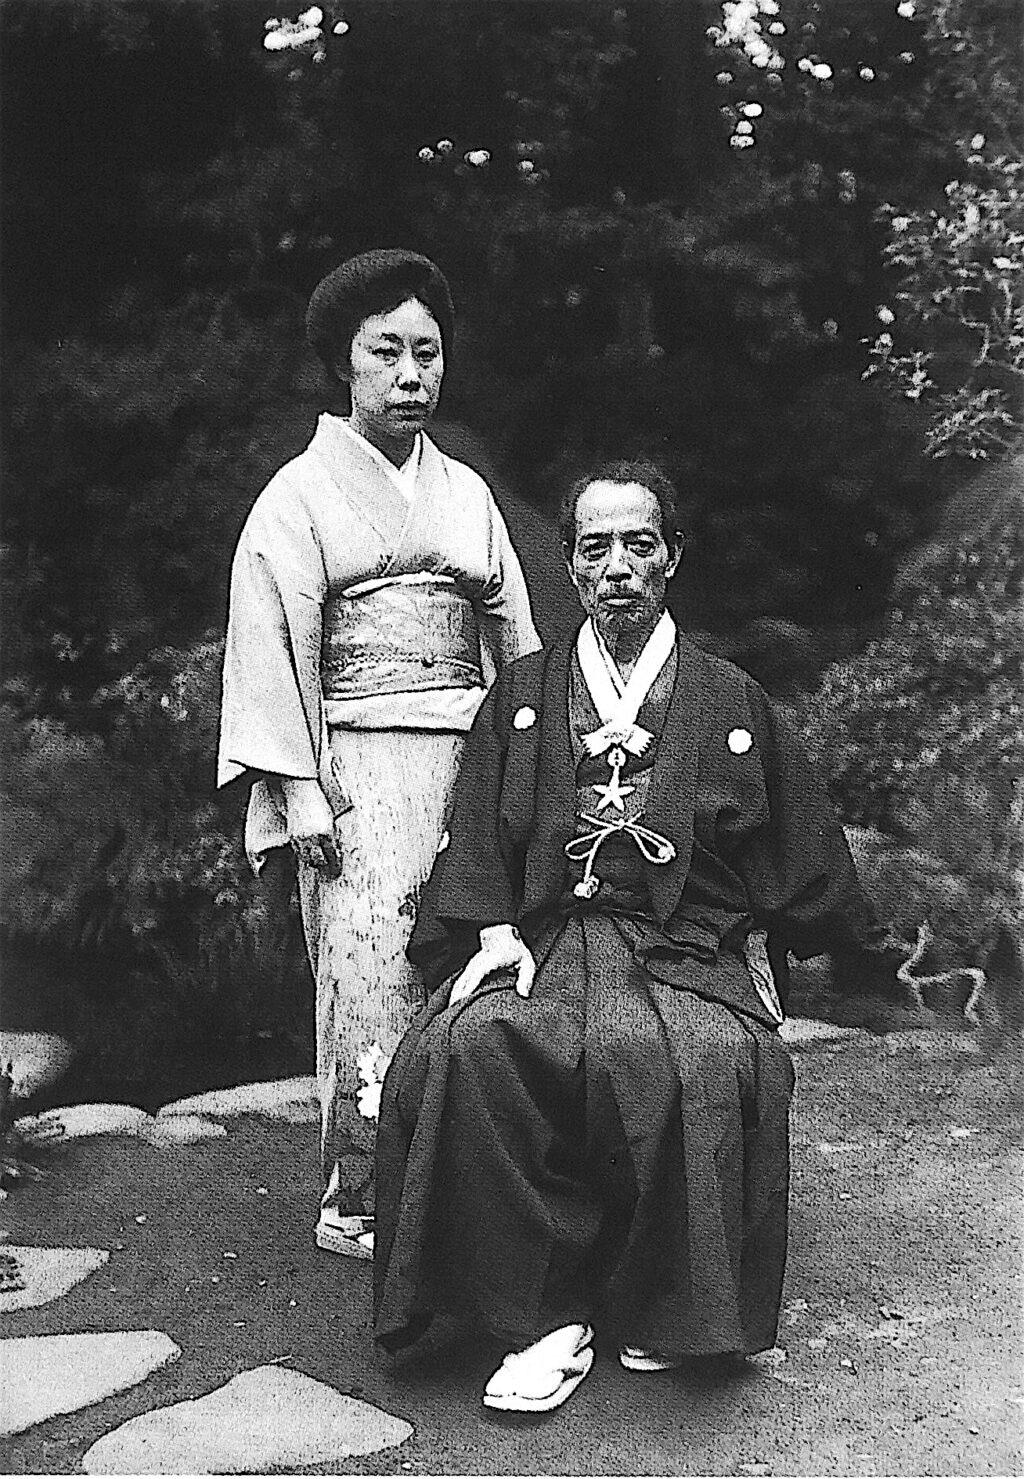 昭和12年(1937)文化勲章受章の記念写真の大観と静子夫人